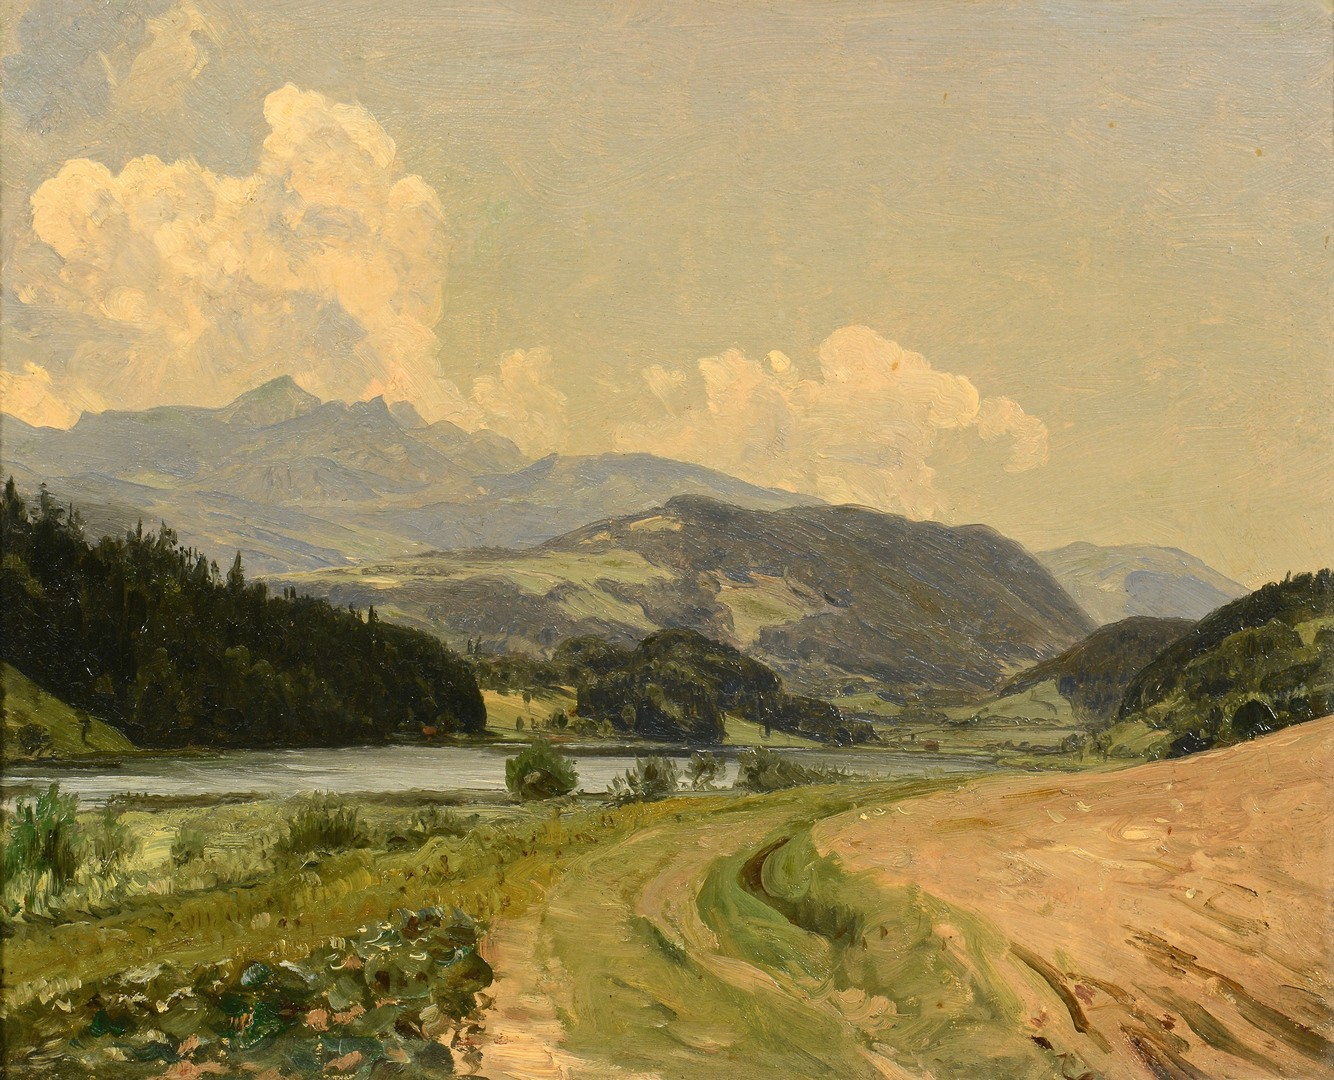 Lot 195: Attr. Thomas W. Whittredge Oil on Canvas Landscape